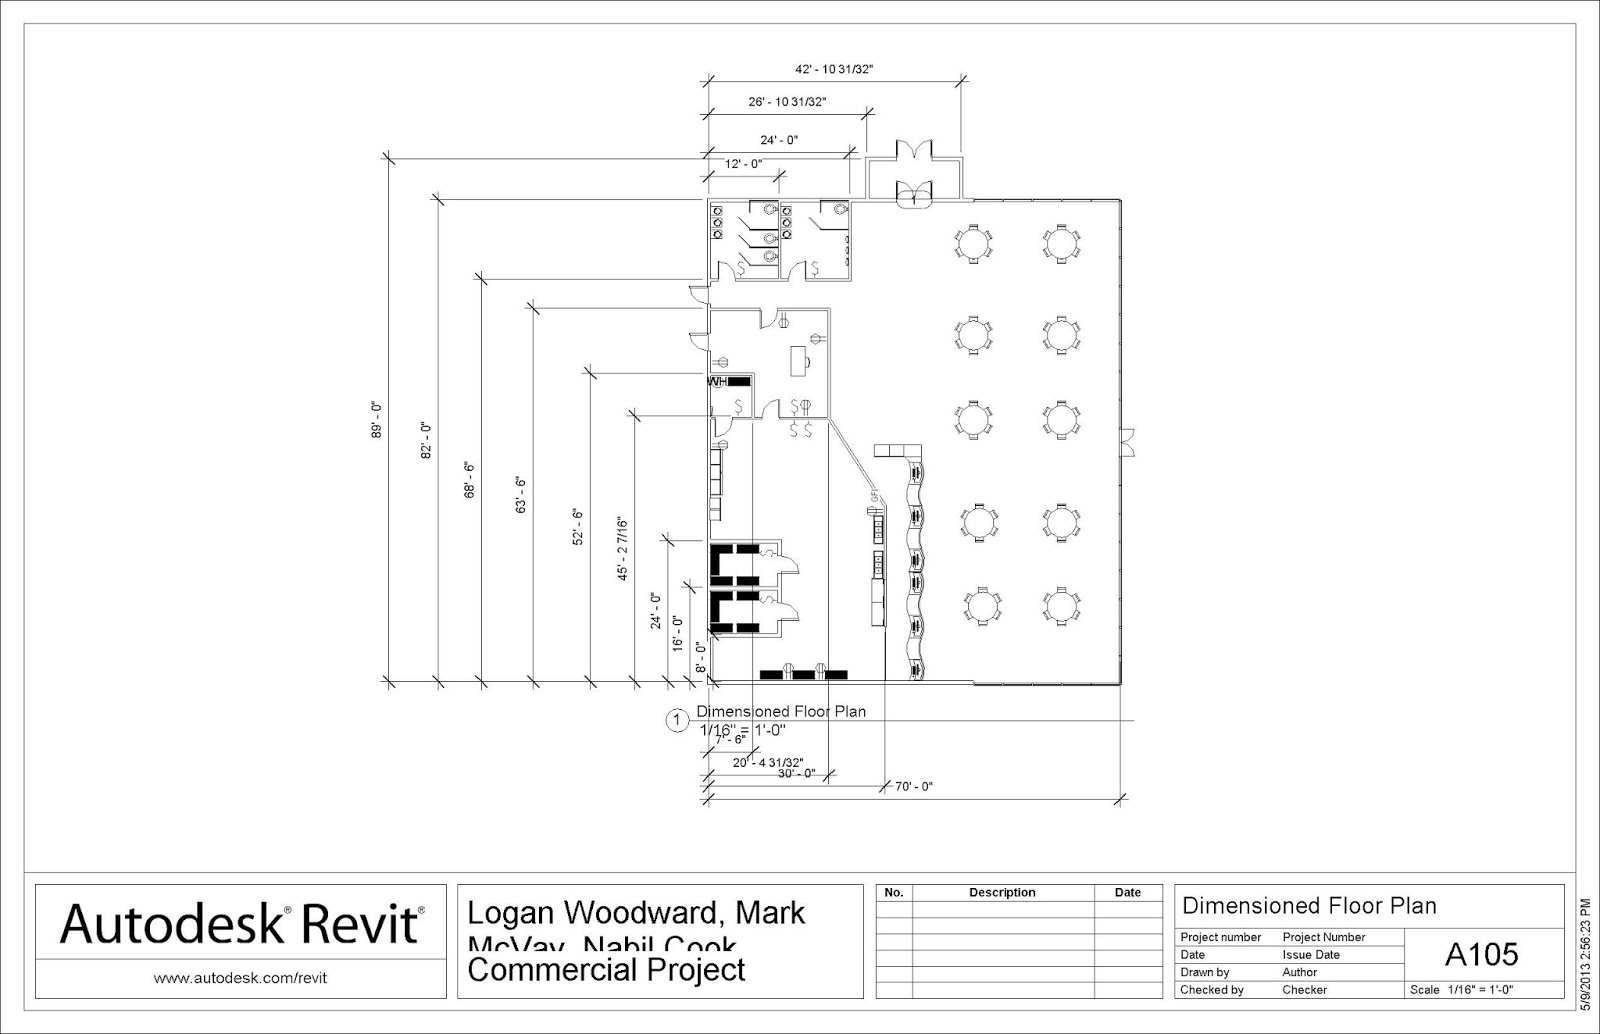 pltw cea commercial building project team lnm jd class blog floor plan dimensioned